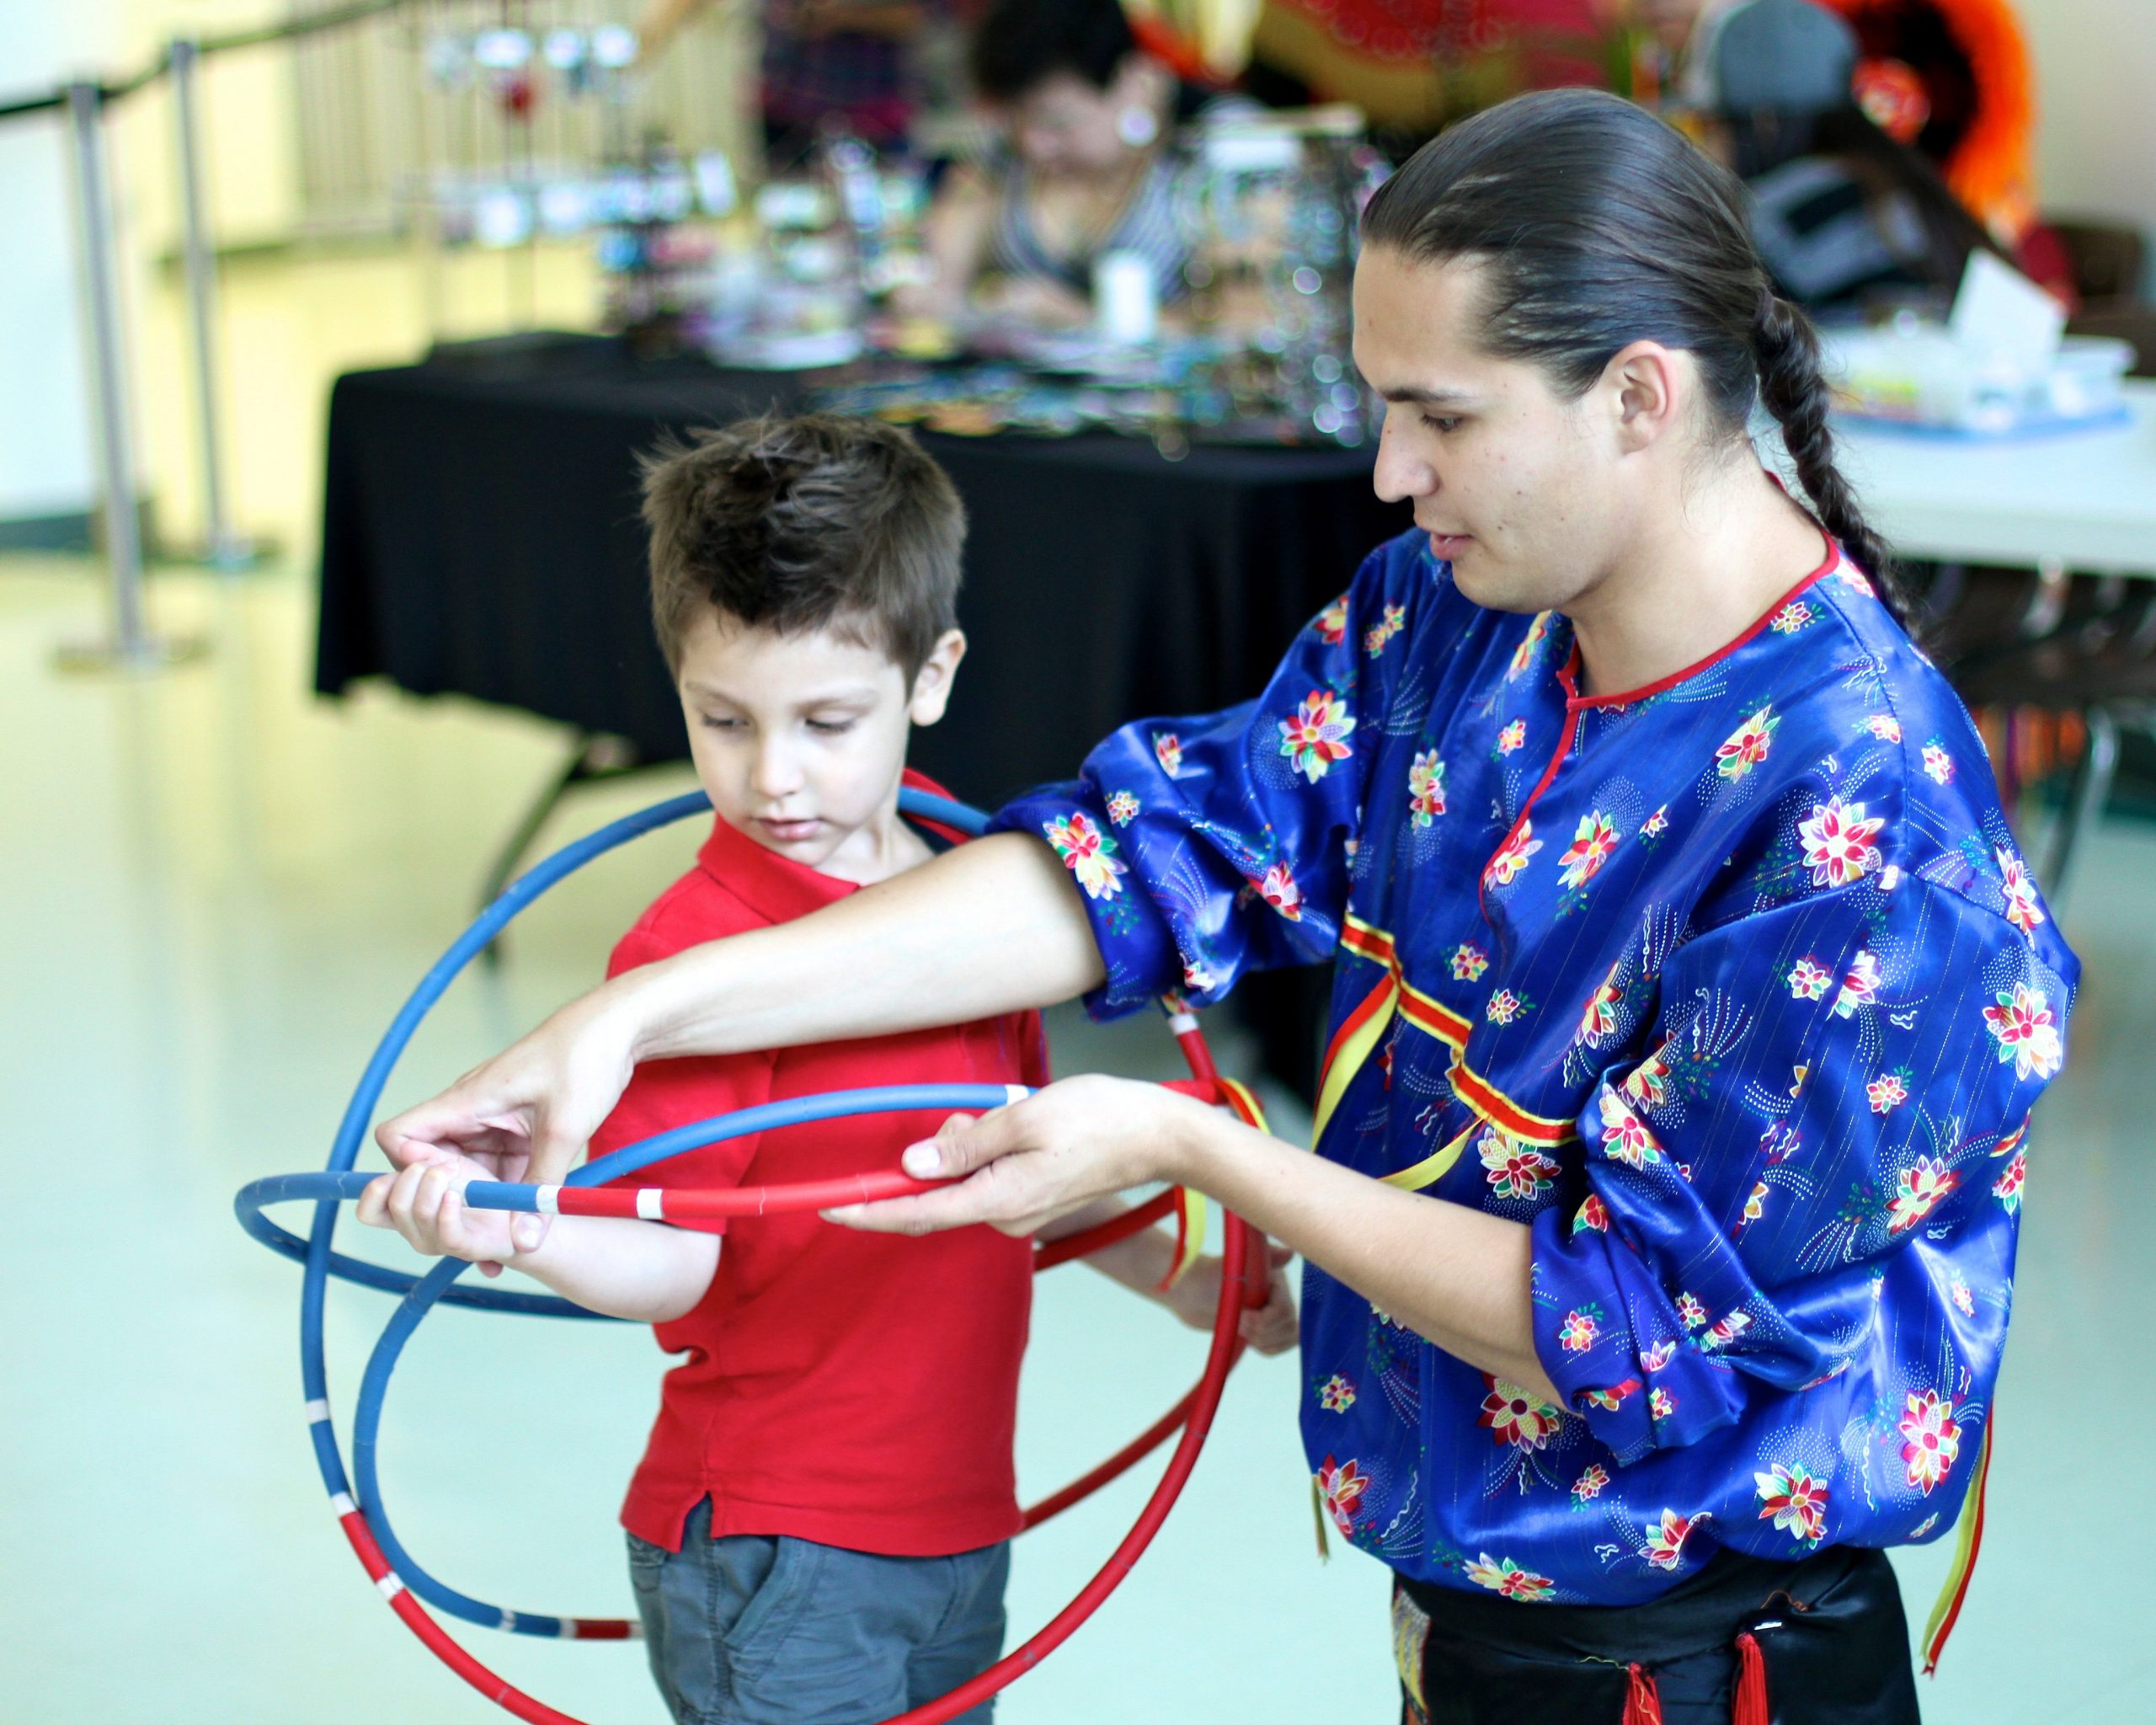 "Hoop dancer teaching young boy. ""Mosaic Regina - First Nations Pavillion"", FNUC Photo by: Alec Couros (CC BY-NC-SA 2.0) [184]"